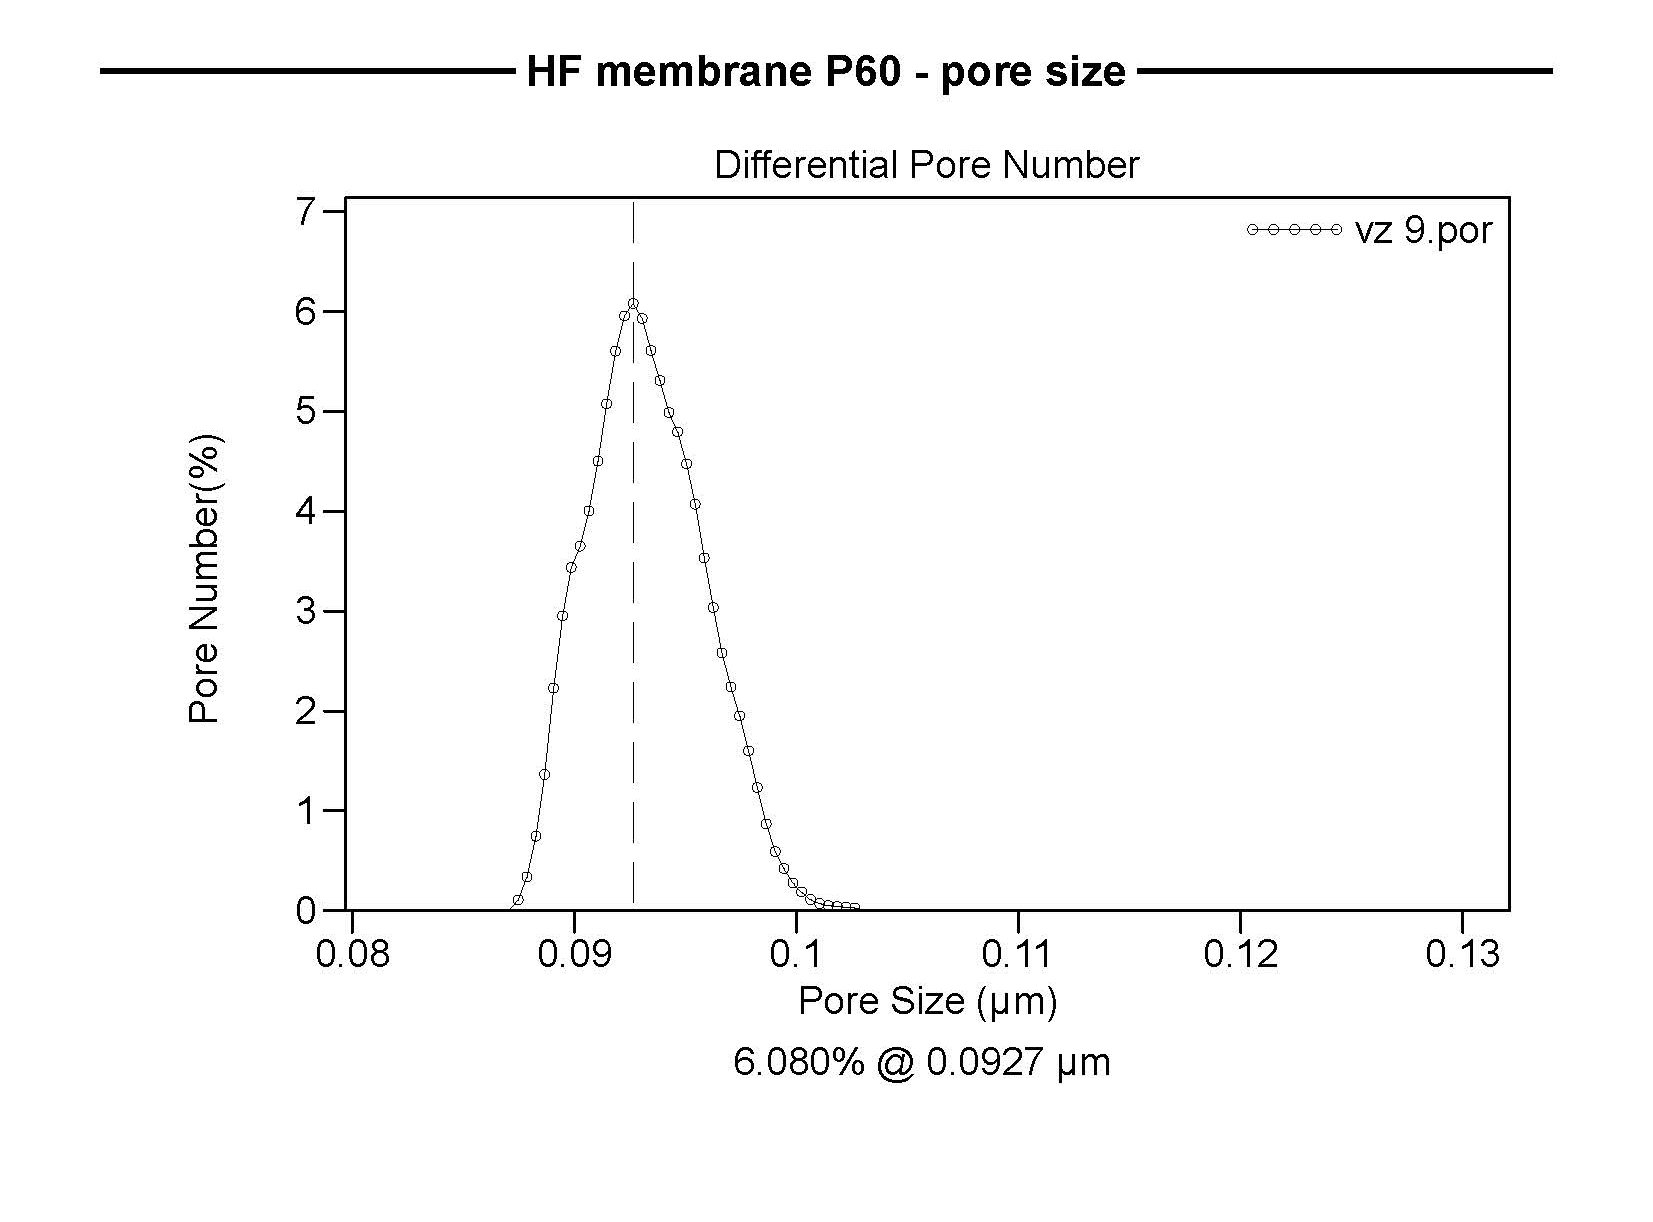 Membrane Mem Contactor Wiring Diagram Pore Size Distribution Of The Pp Measurment